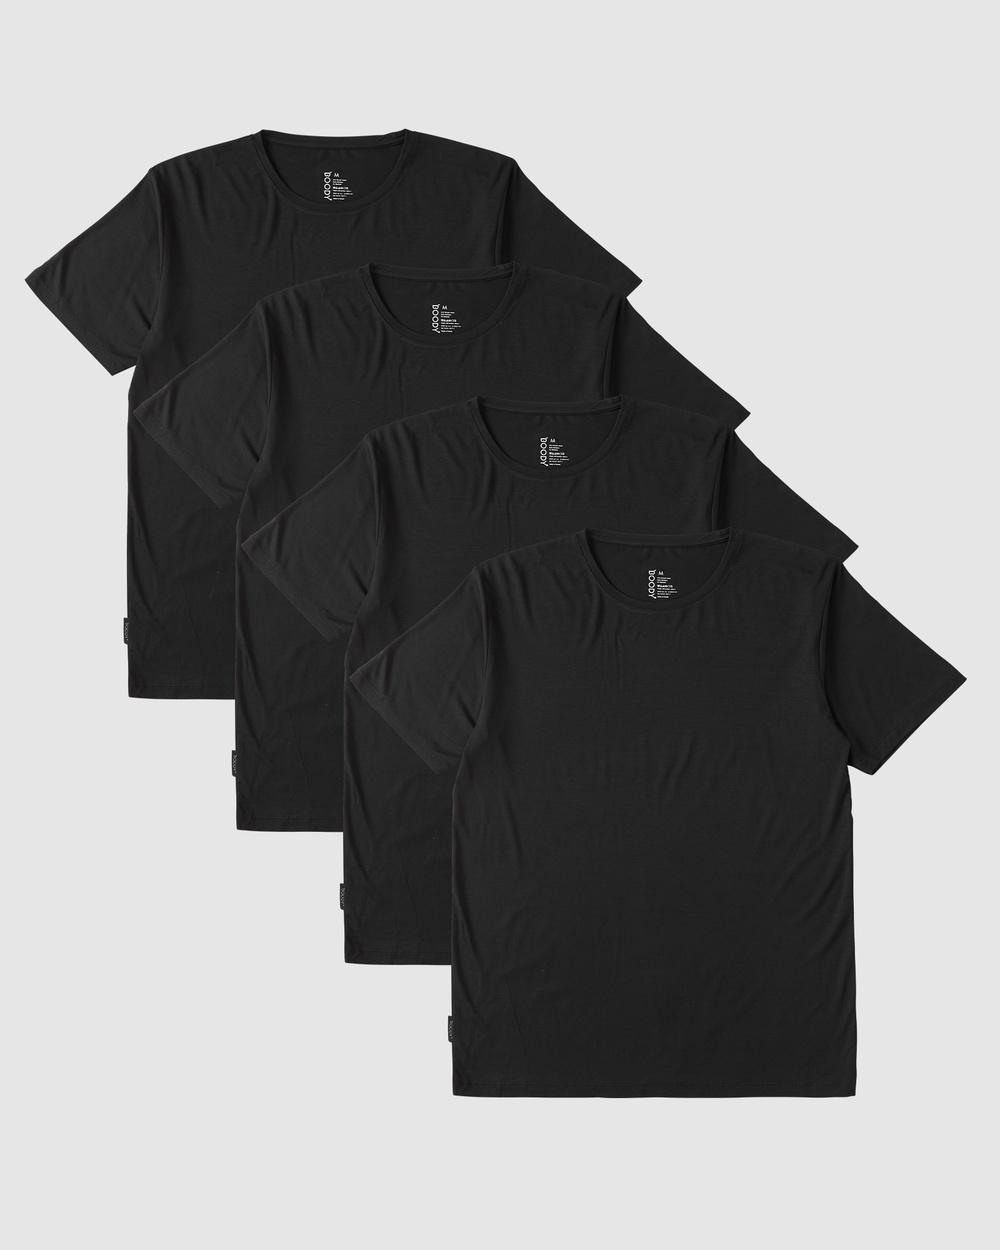 Boody Organic Bamboo Eco Wear - 4 Pack Crew Neck T Shirt - Short Sleeve T-Shirts (Black) 4 Pack Crew Neck T-Shirt